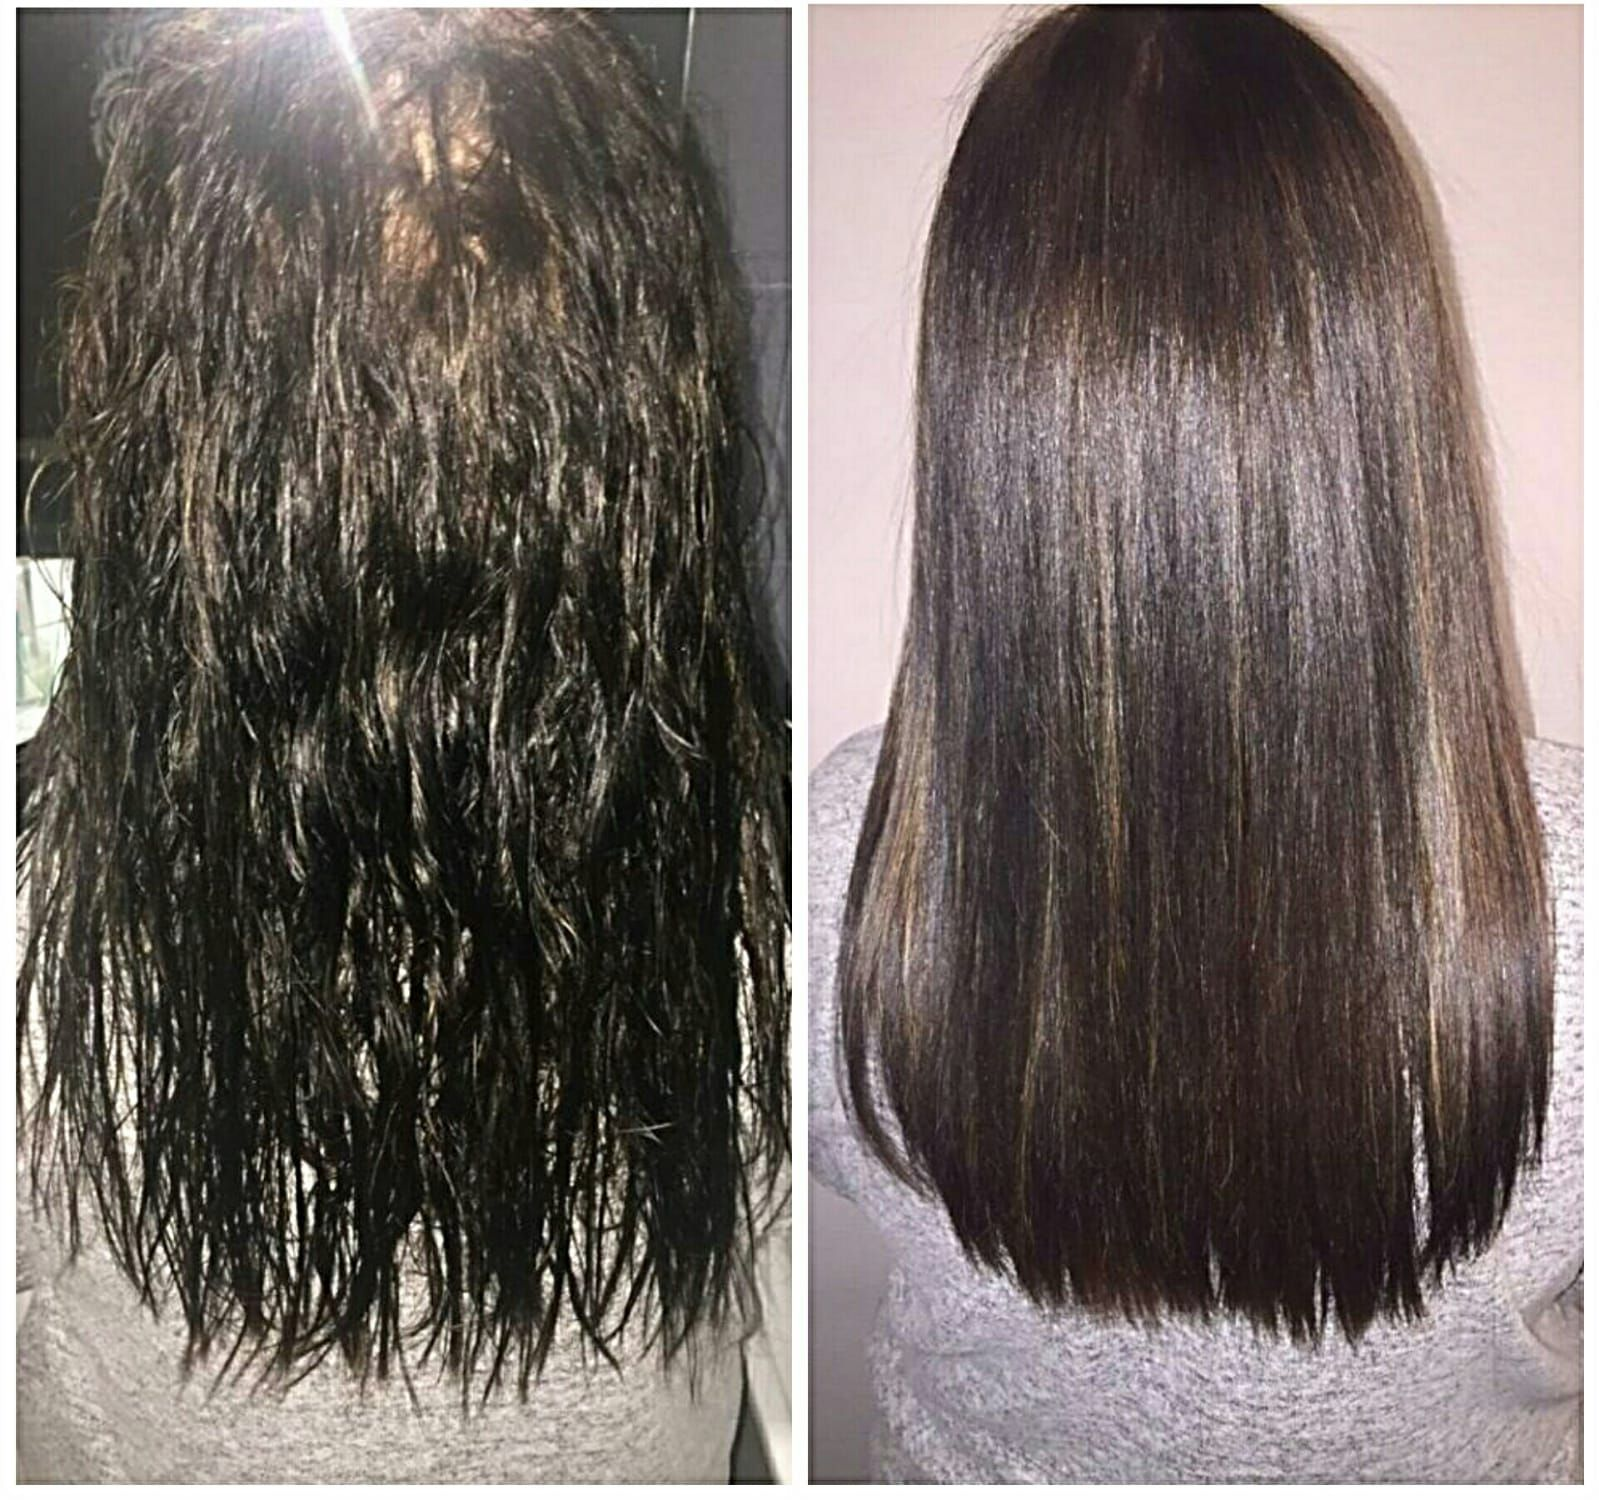 Botox Protein Glow'Tox Reconstruit et Gaine Vos Cheveux